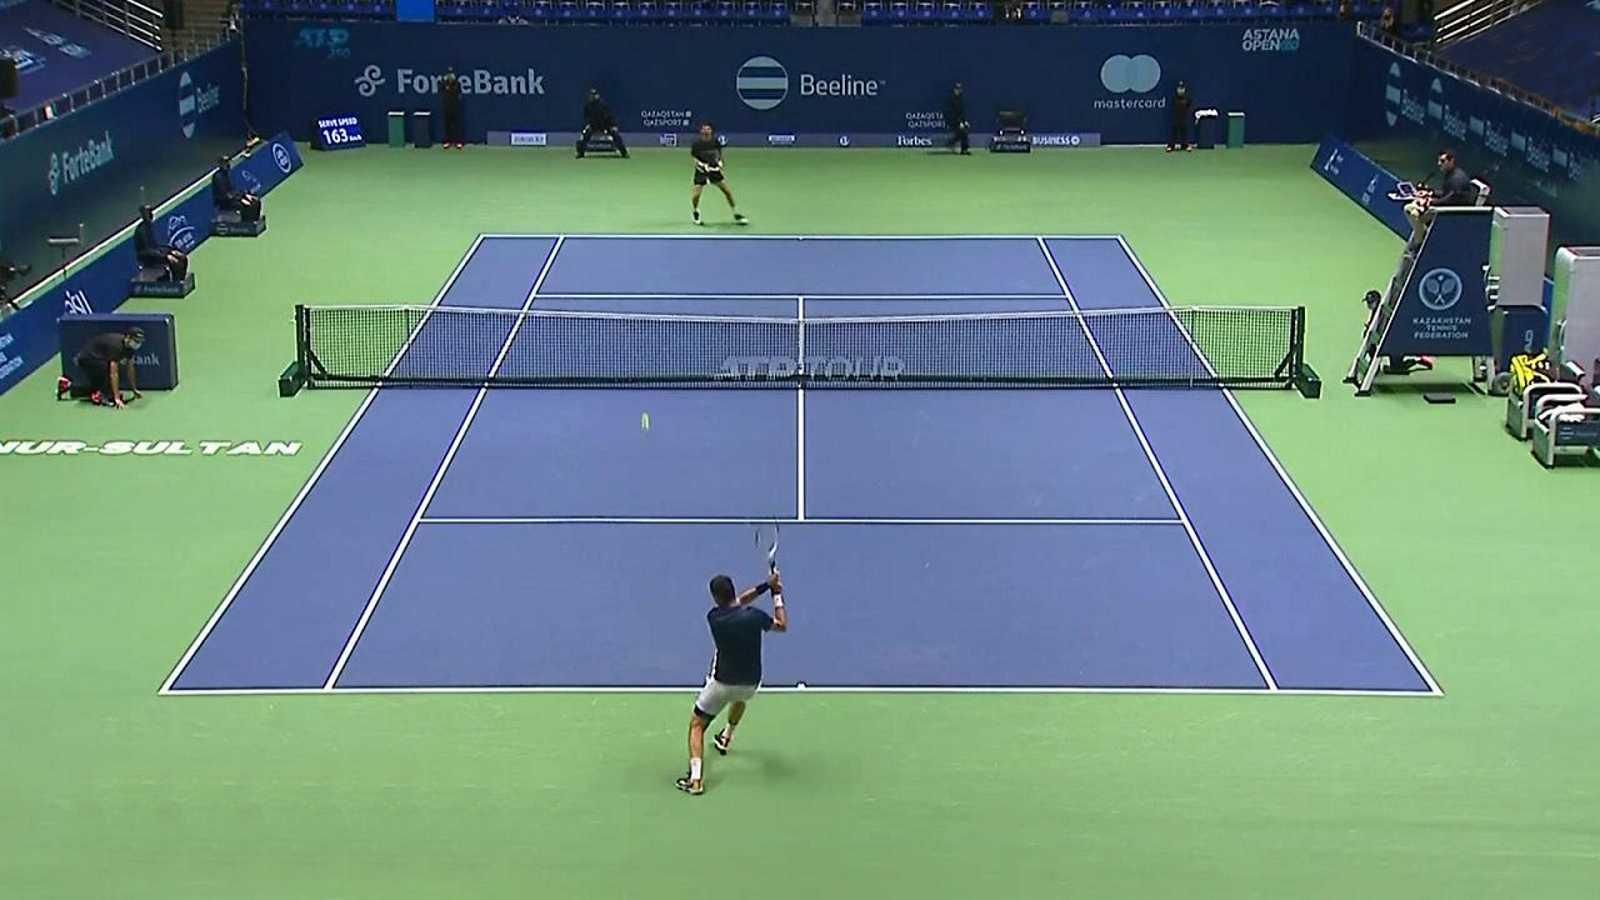 Tenis - ATP 250 Torneo Astaná: Federico Delbonis - Mikhail Kukushkin - ver ahora